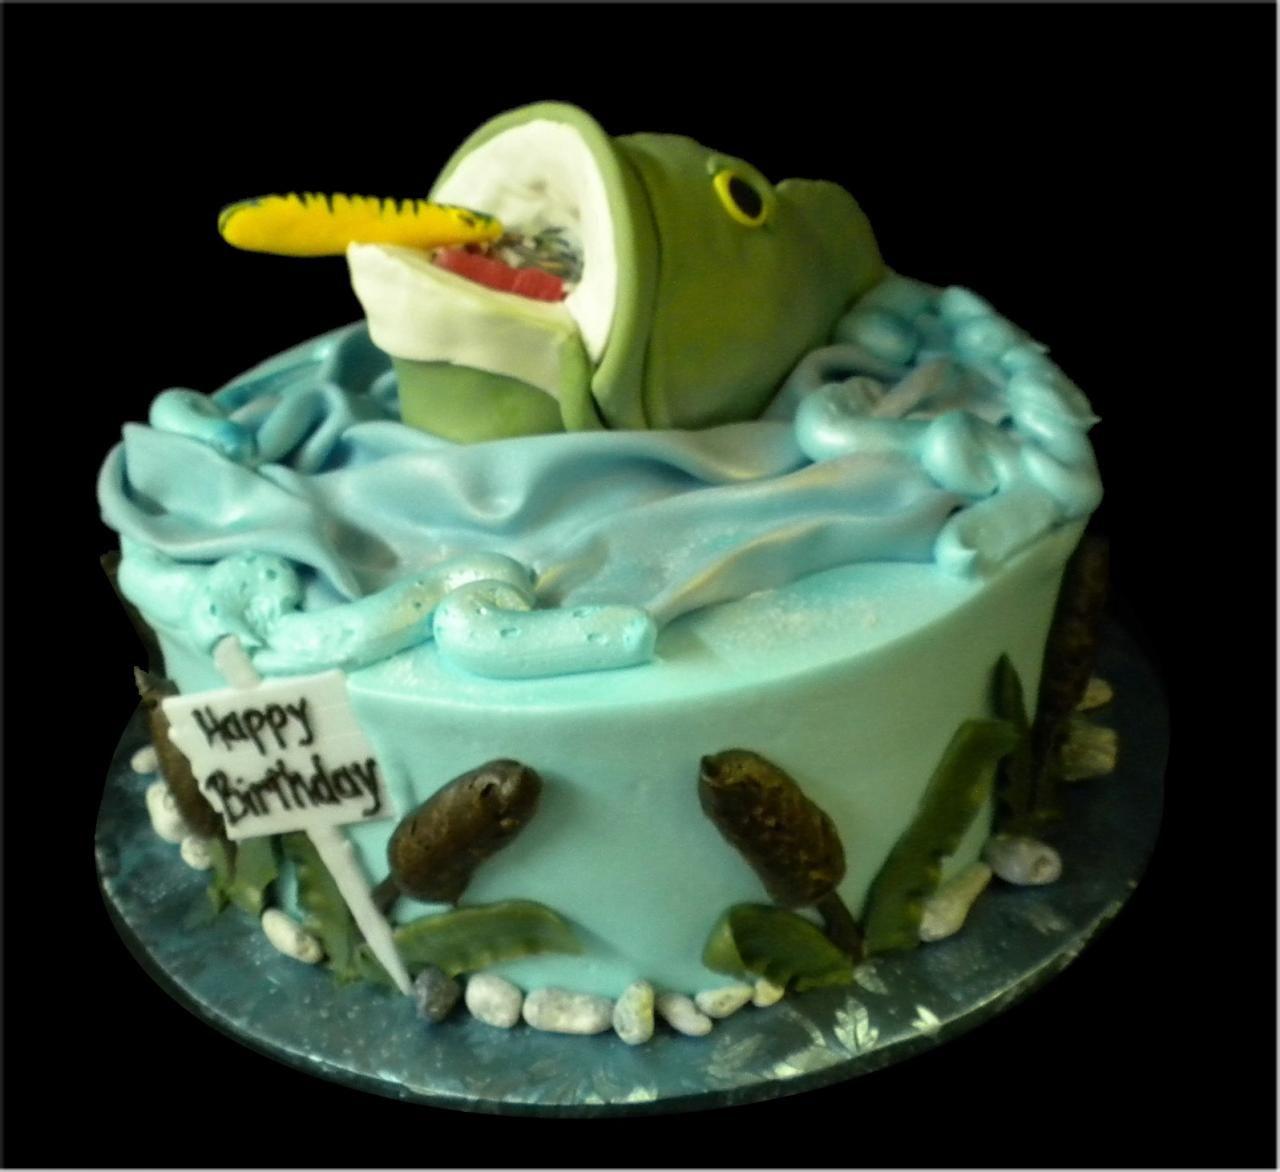 Fisherman 39 s birthday cake green and blue buttercream iced for Fishing birthday cake